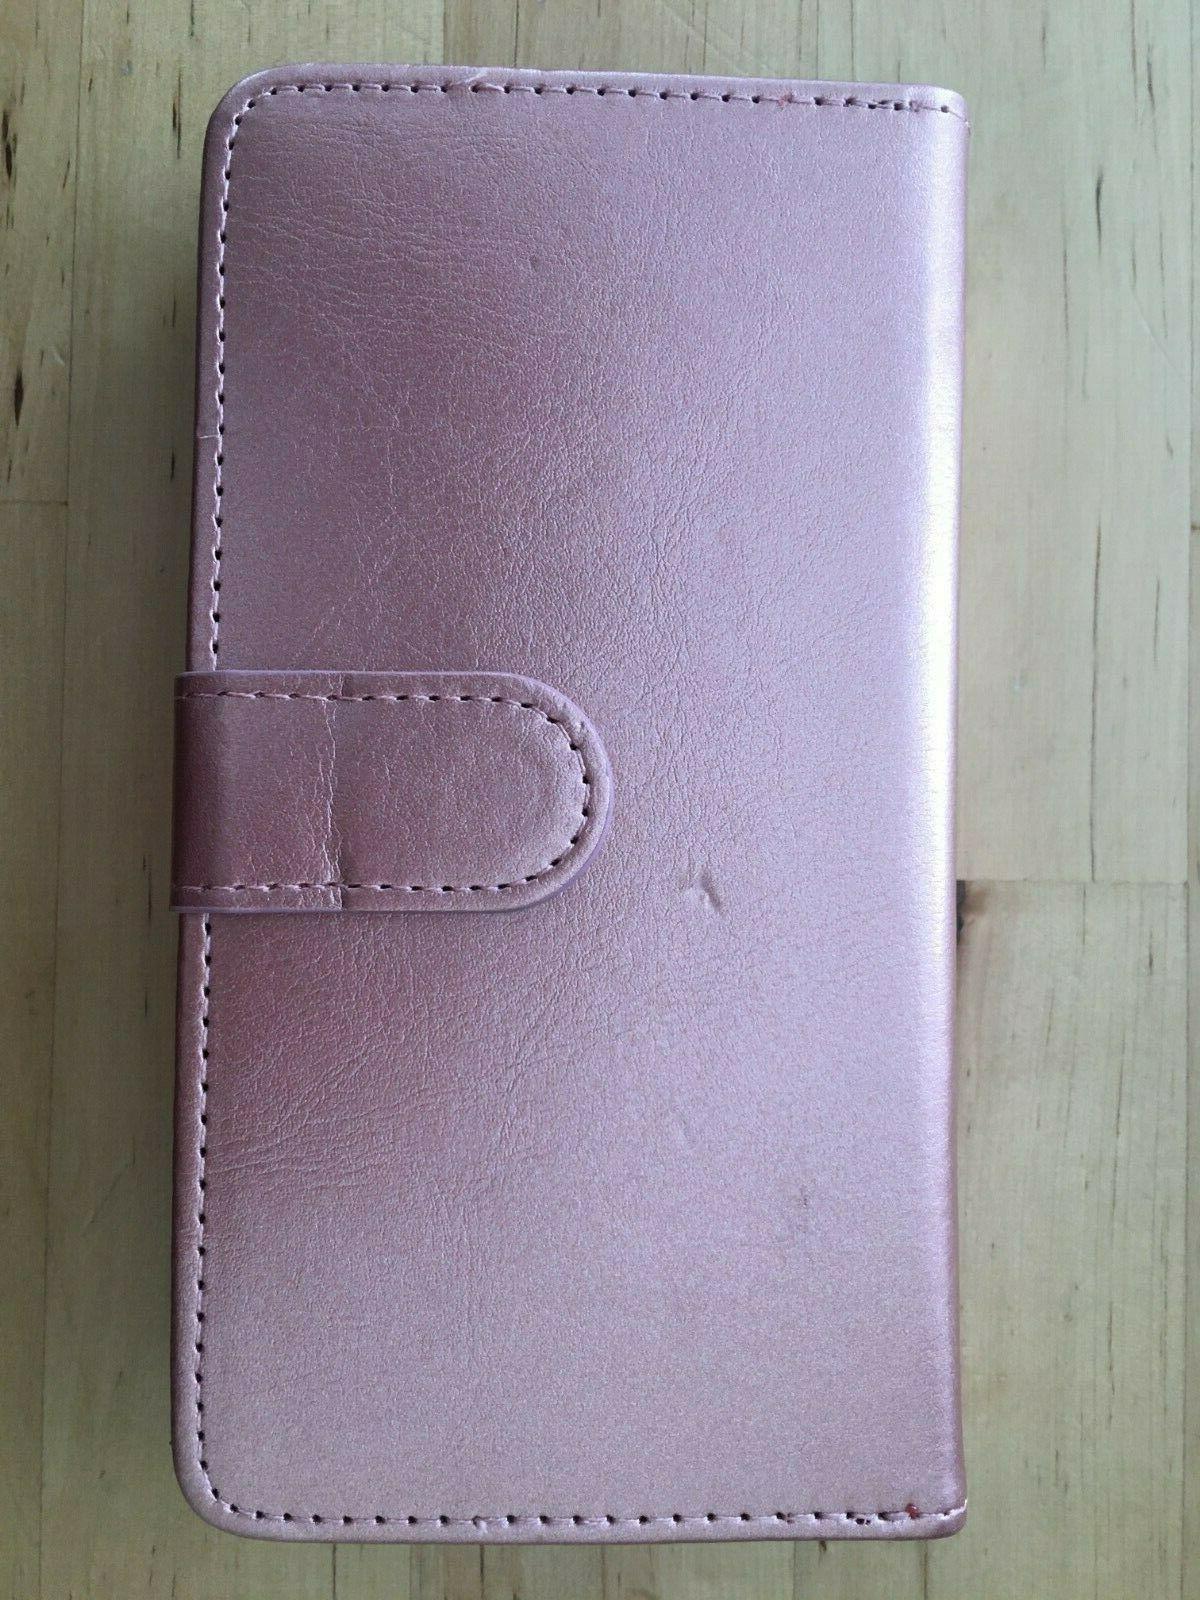 njjex for moto z3 wallet casepu leather